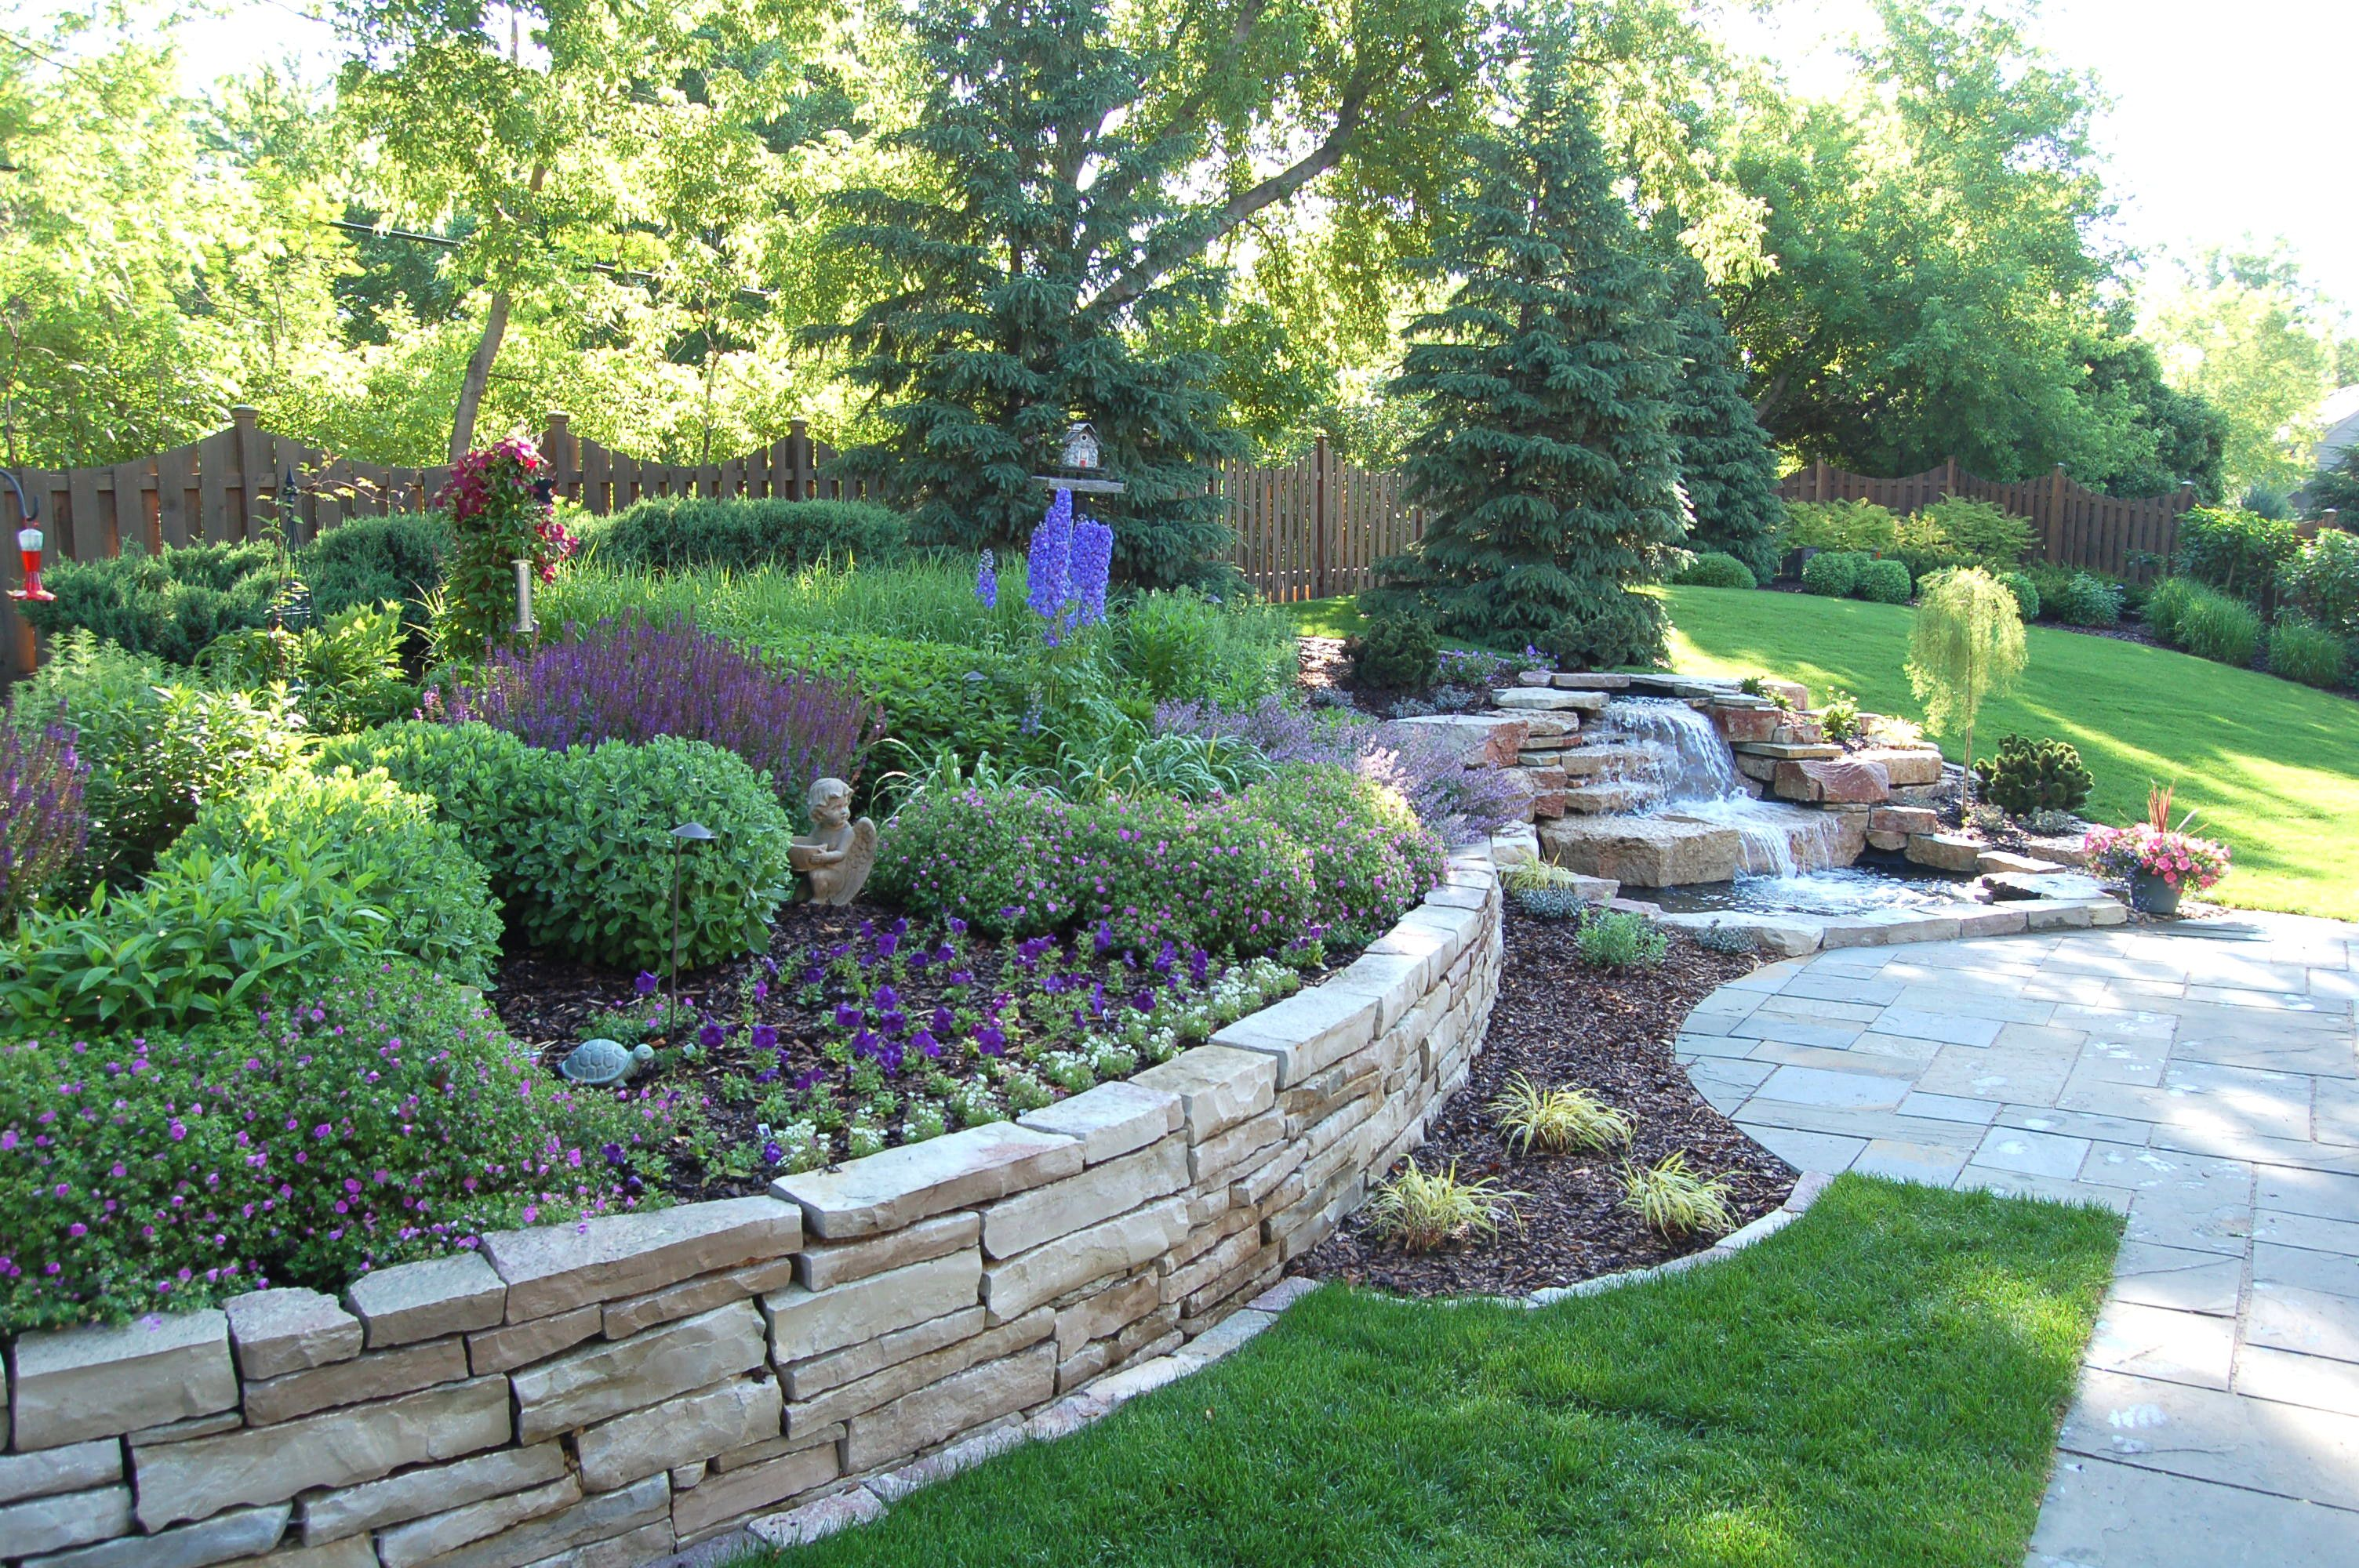 Fondulac Wall And Perennial Gardens Gives Way To Chilton 400 x 300